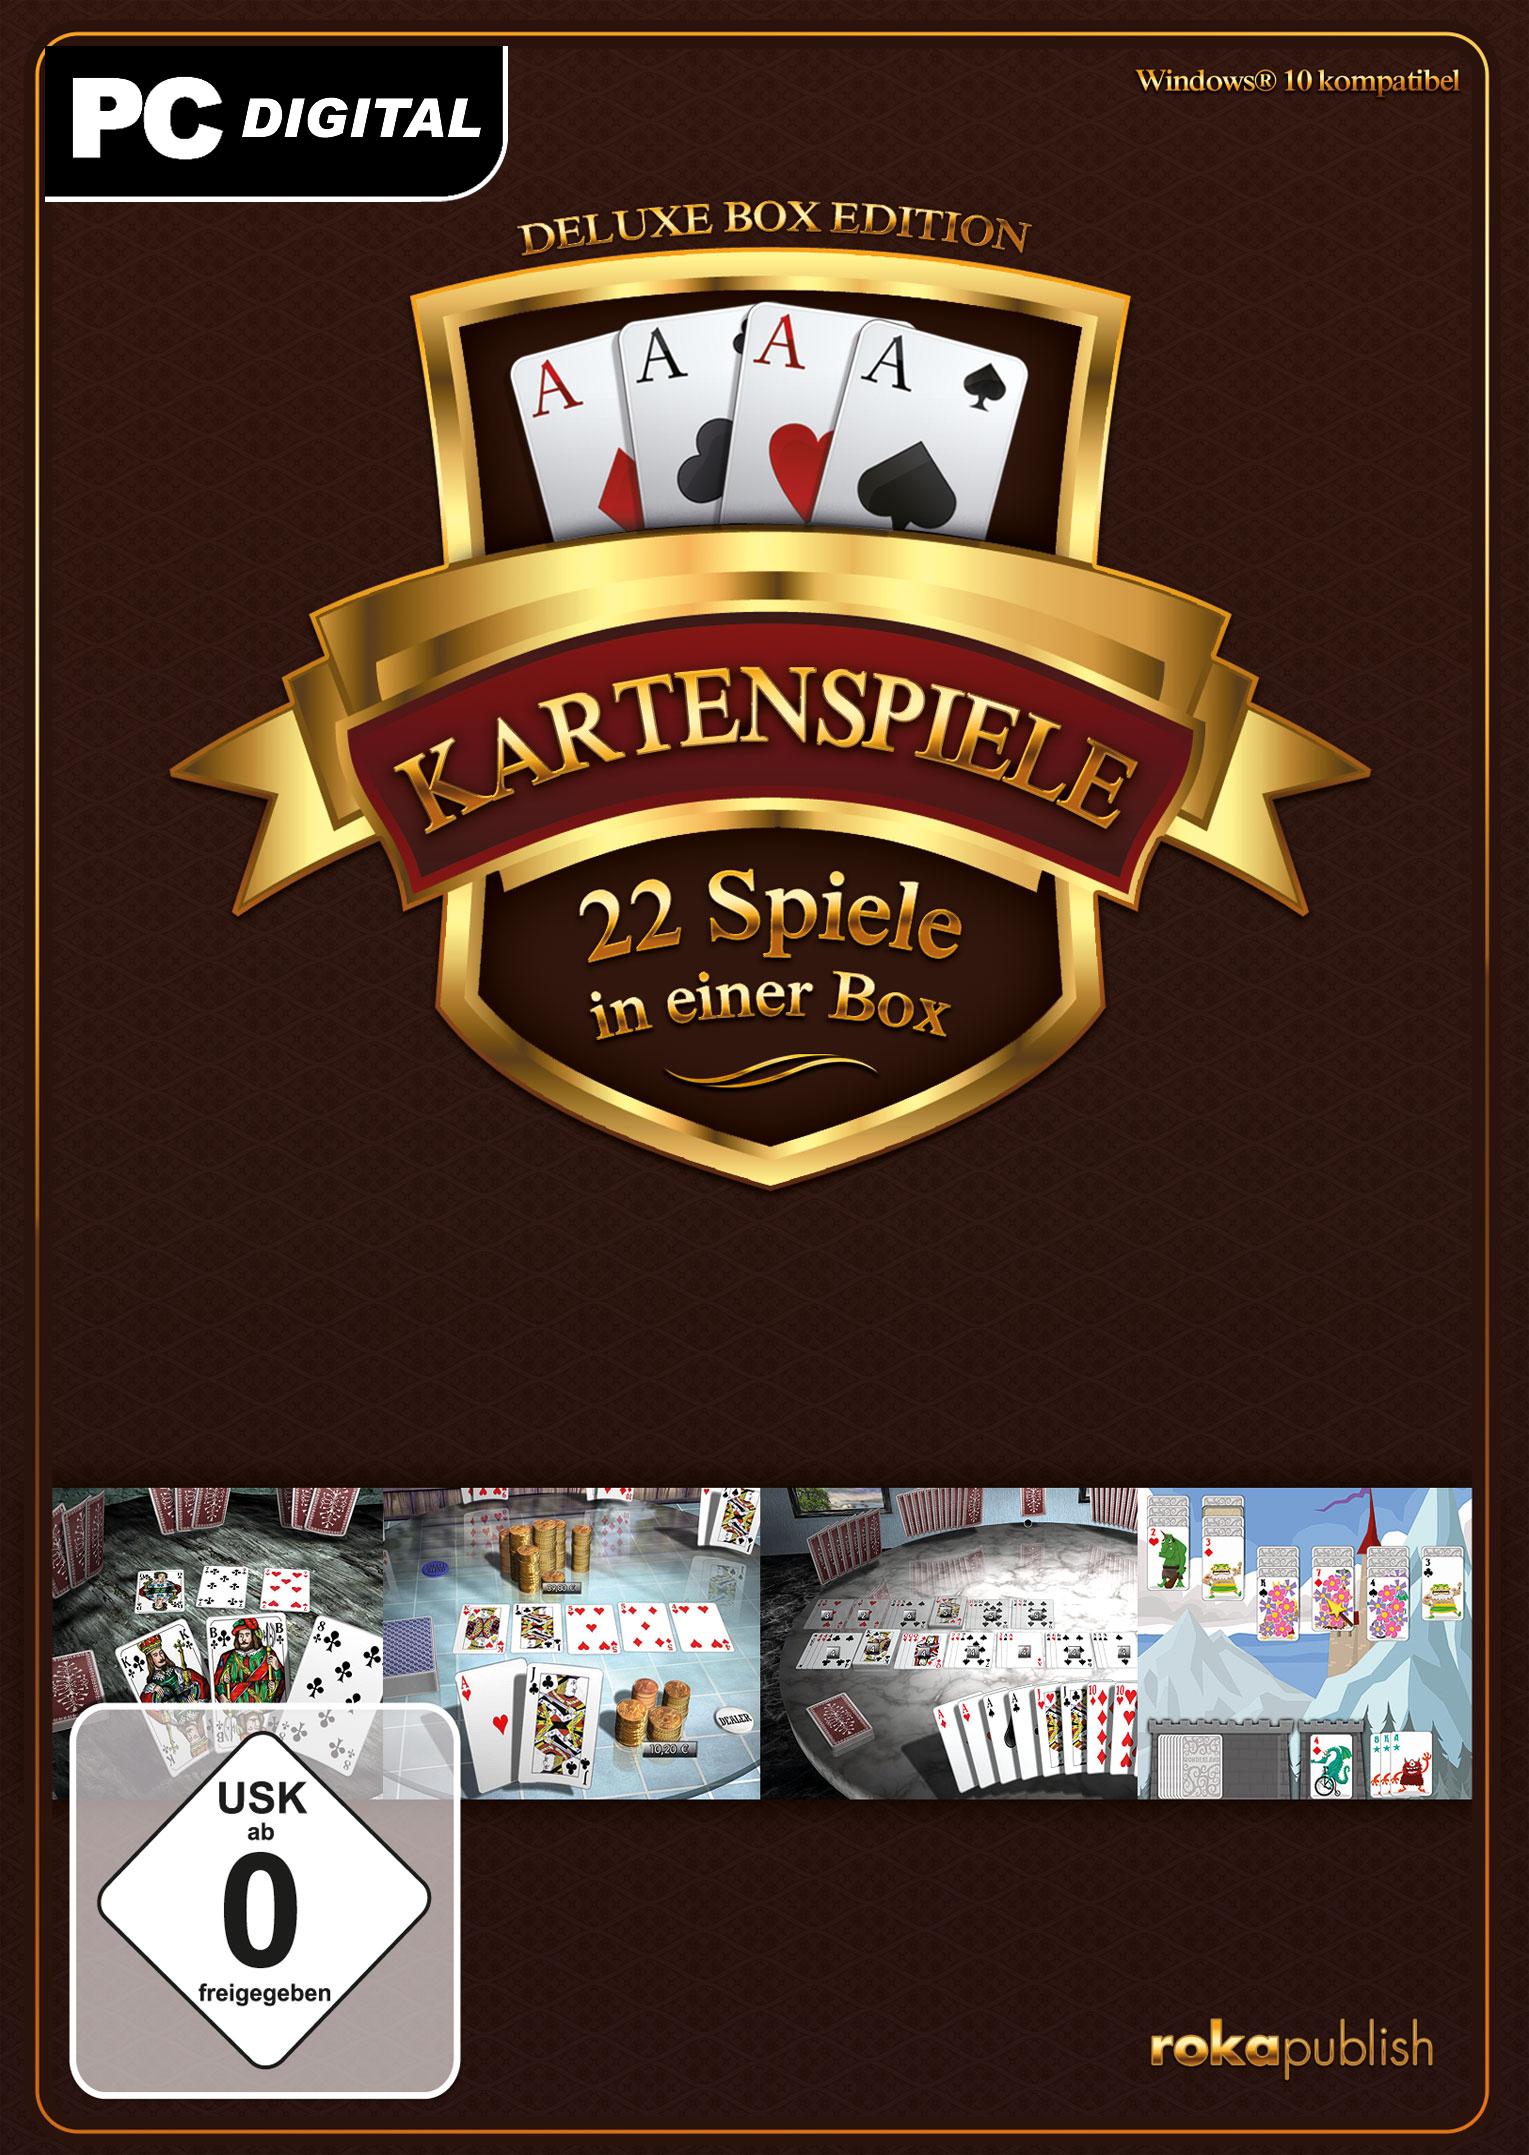 kartenspiele-22-in-1-deluxe-box-edition-pc-download